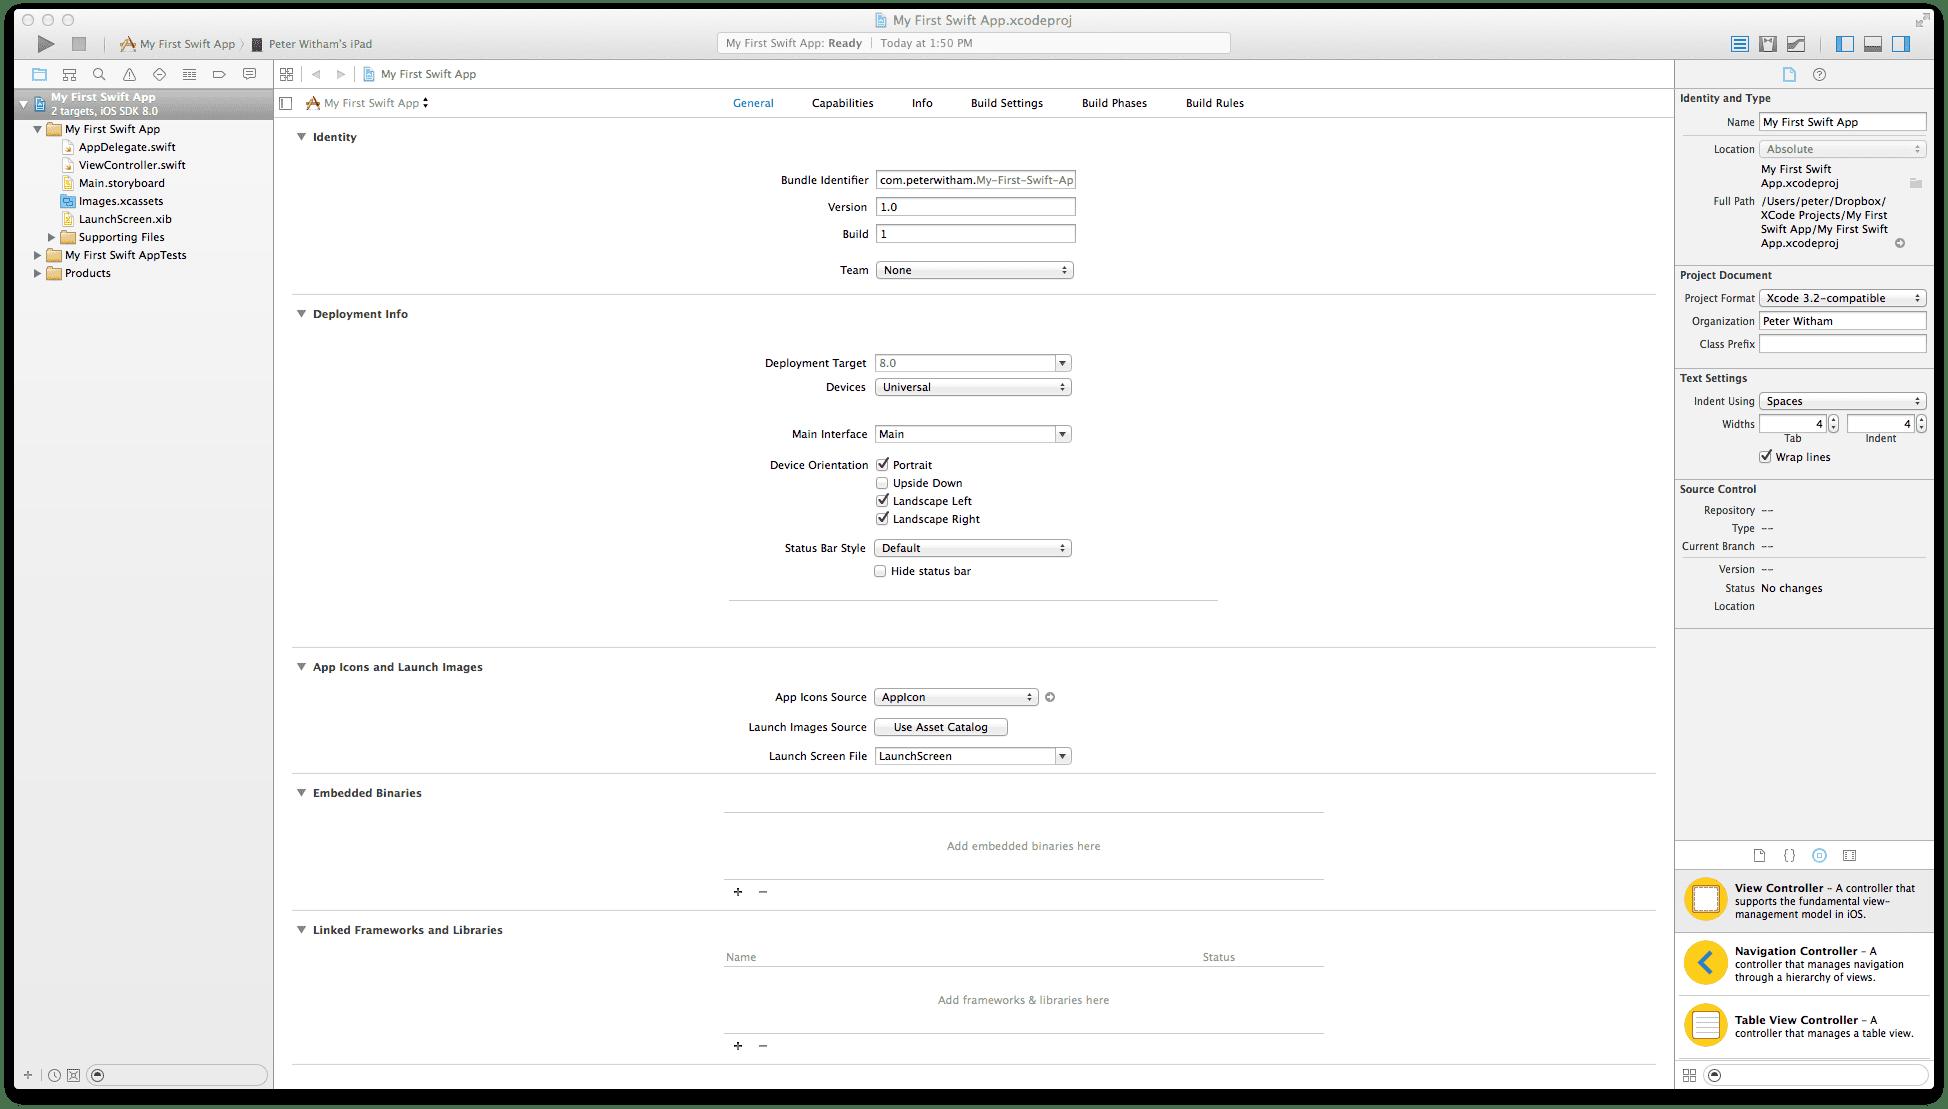 Xcode 6 - New Swift Application Default Start